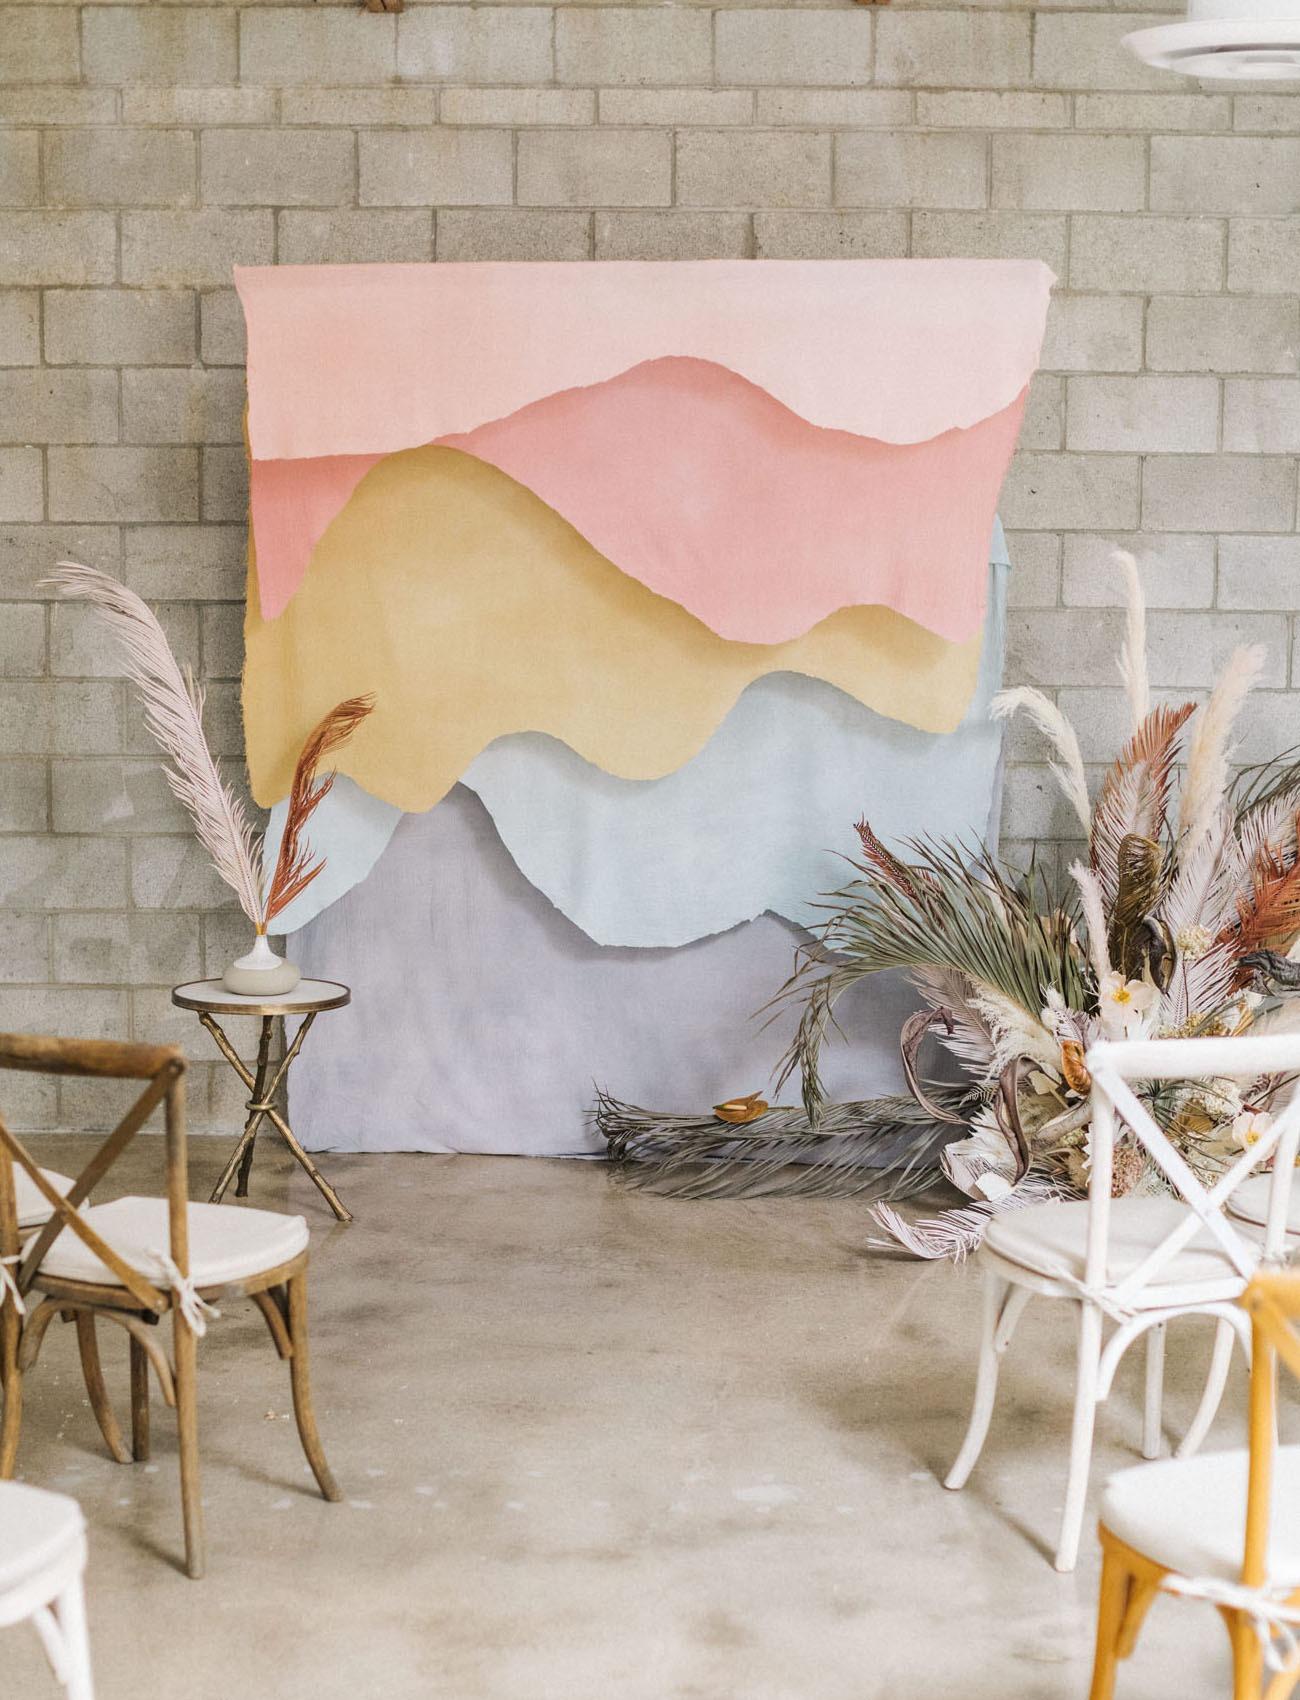 pastel cloth waves DIY wedding backdrop at an indoors industrial wedding venue